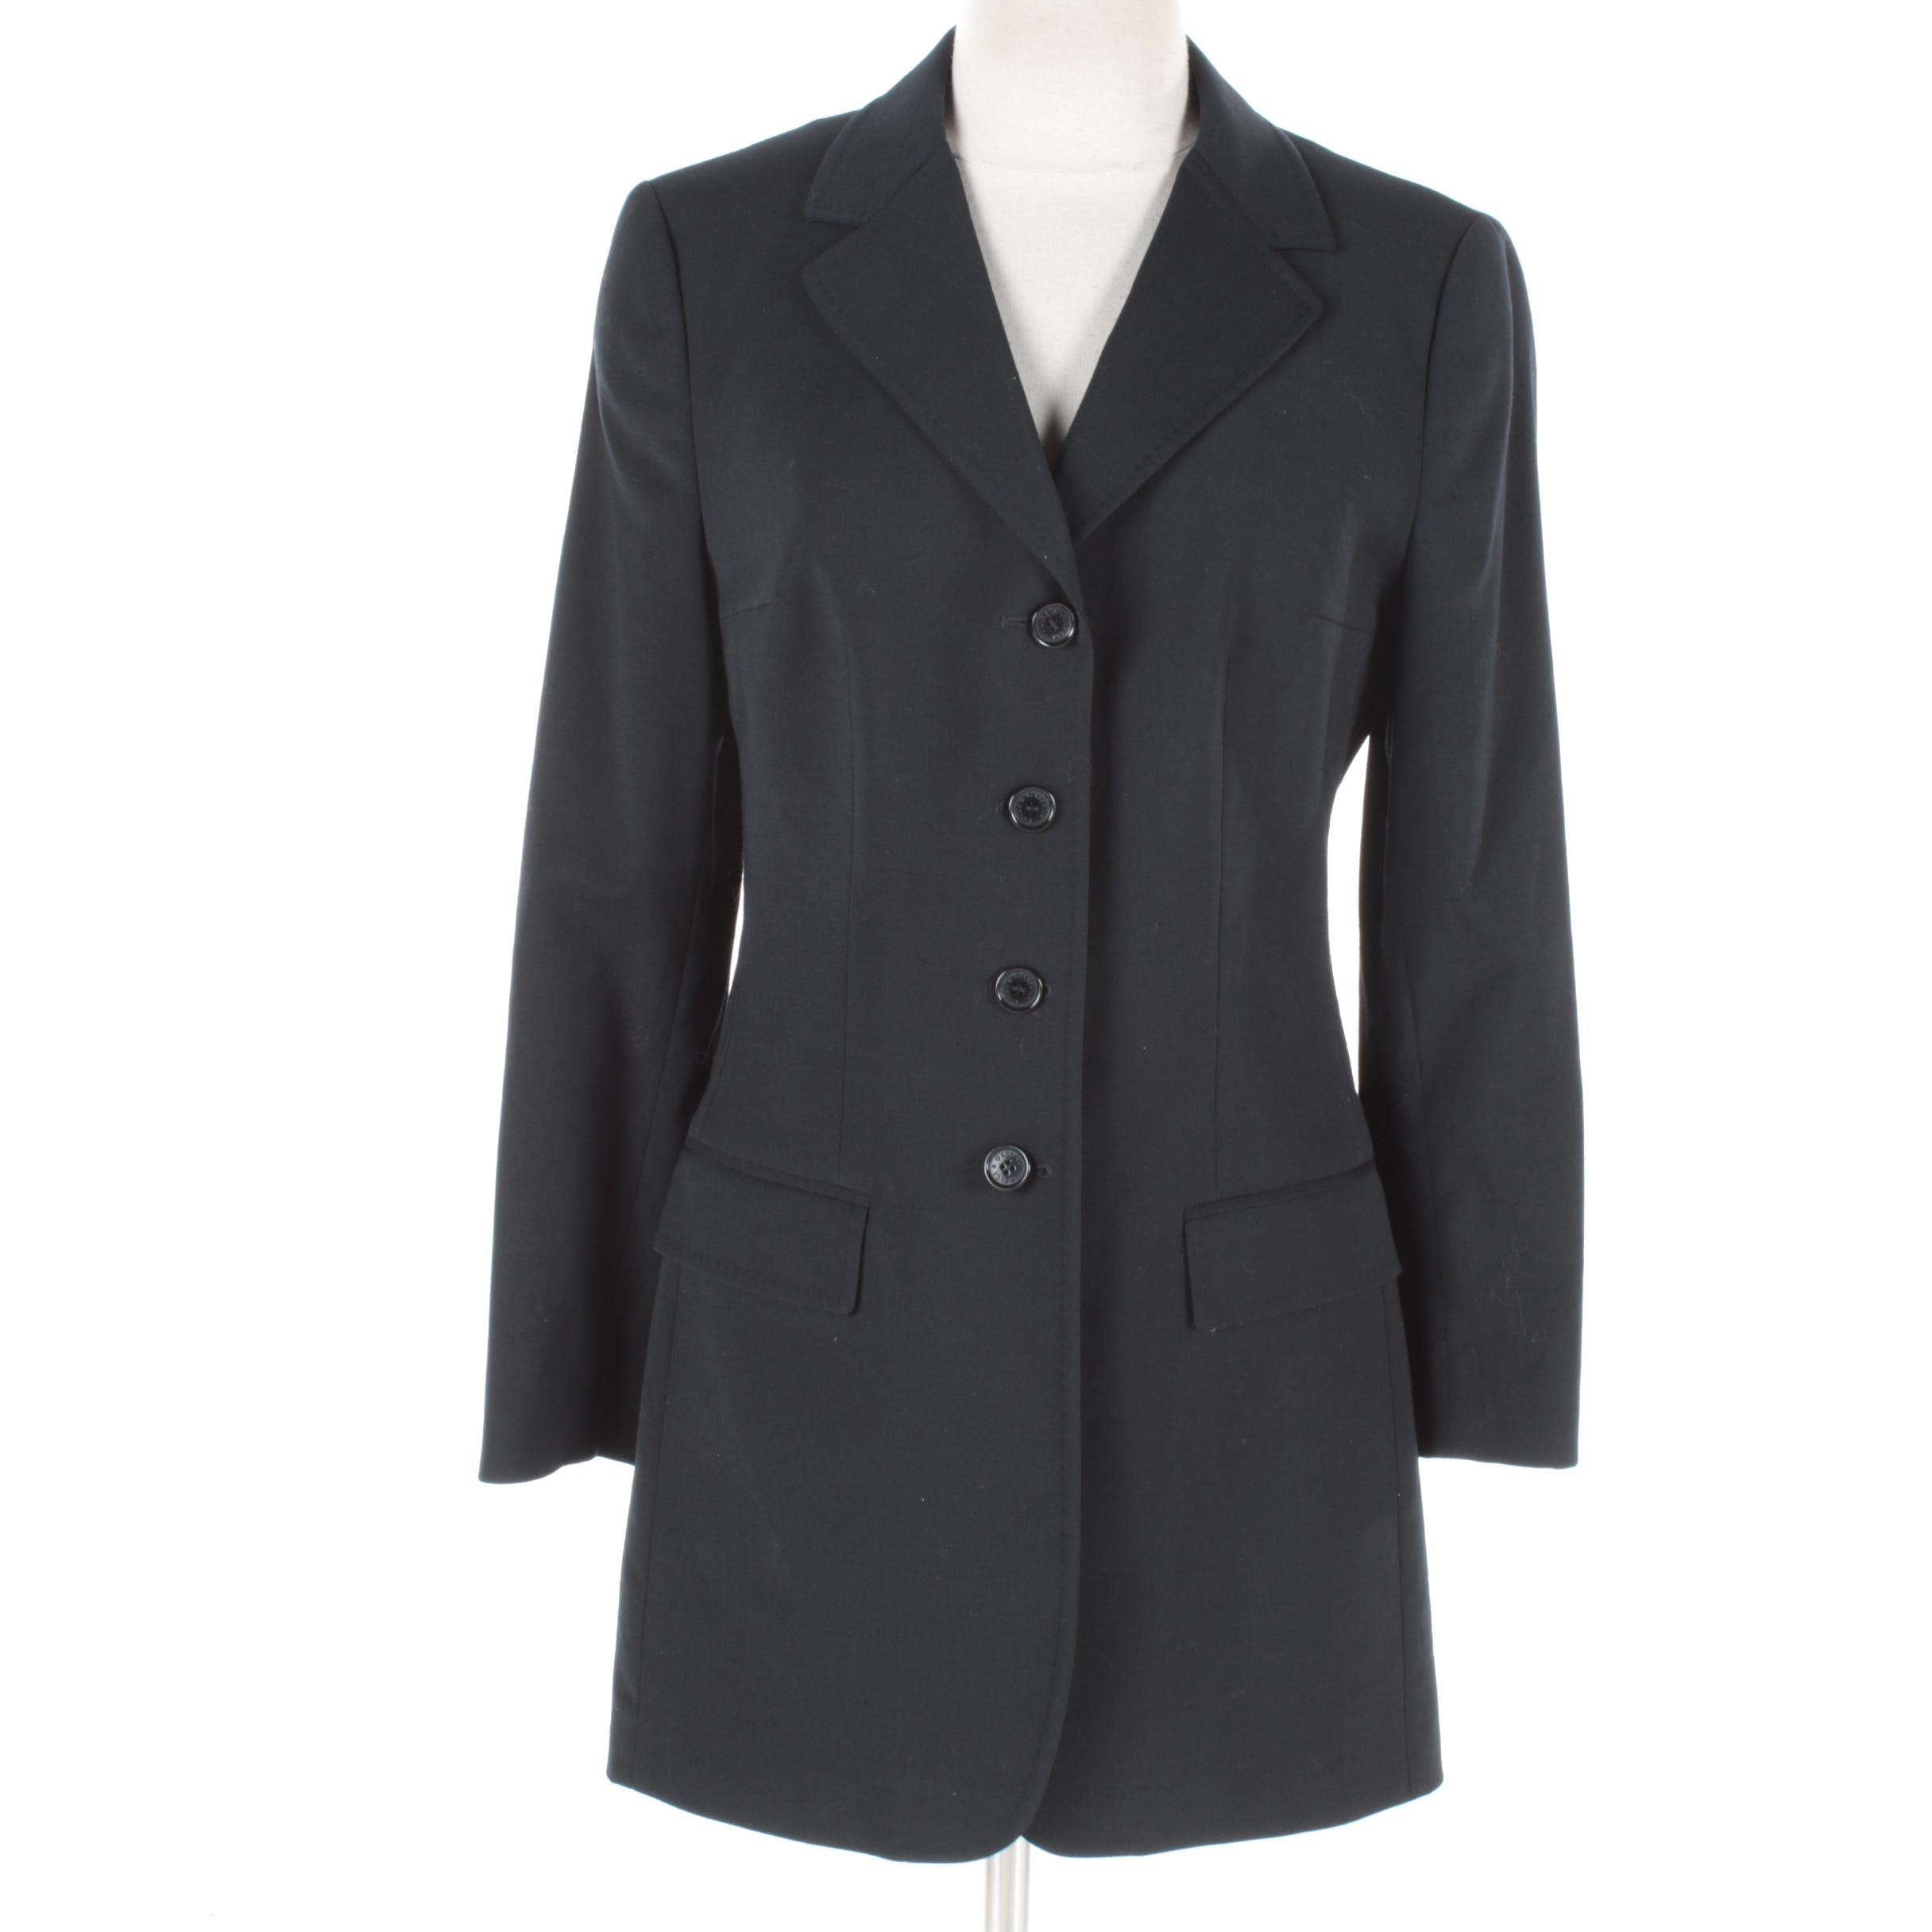 Women's Dolce & Gabbana Suit Jacket